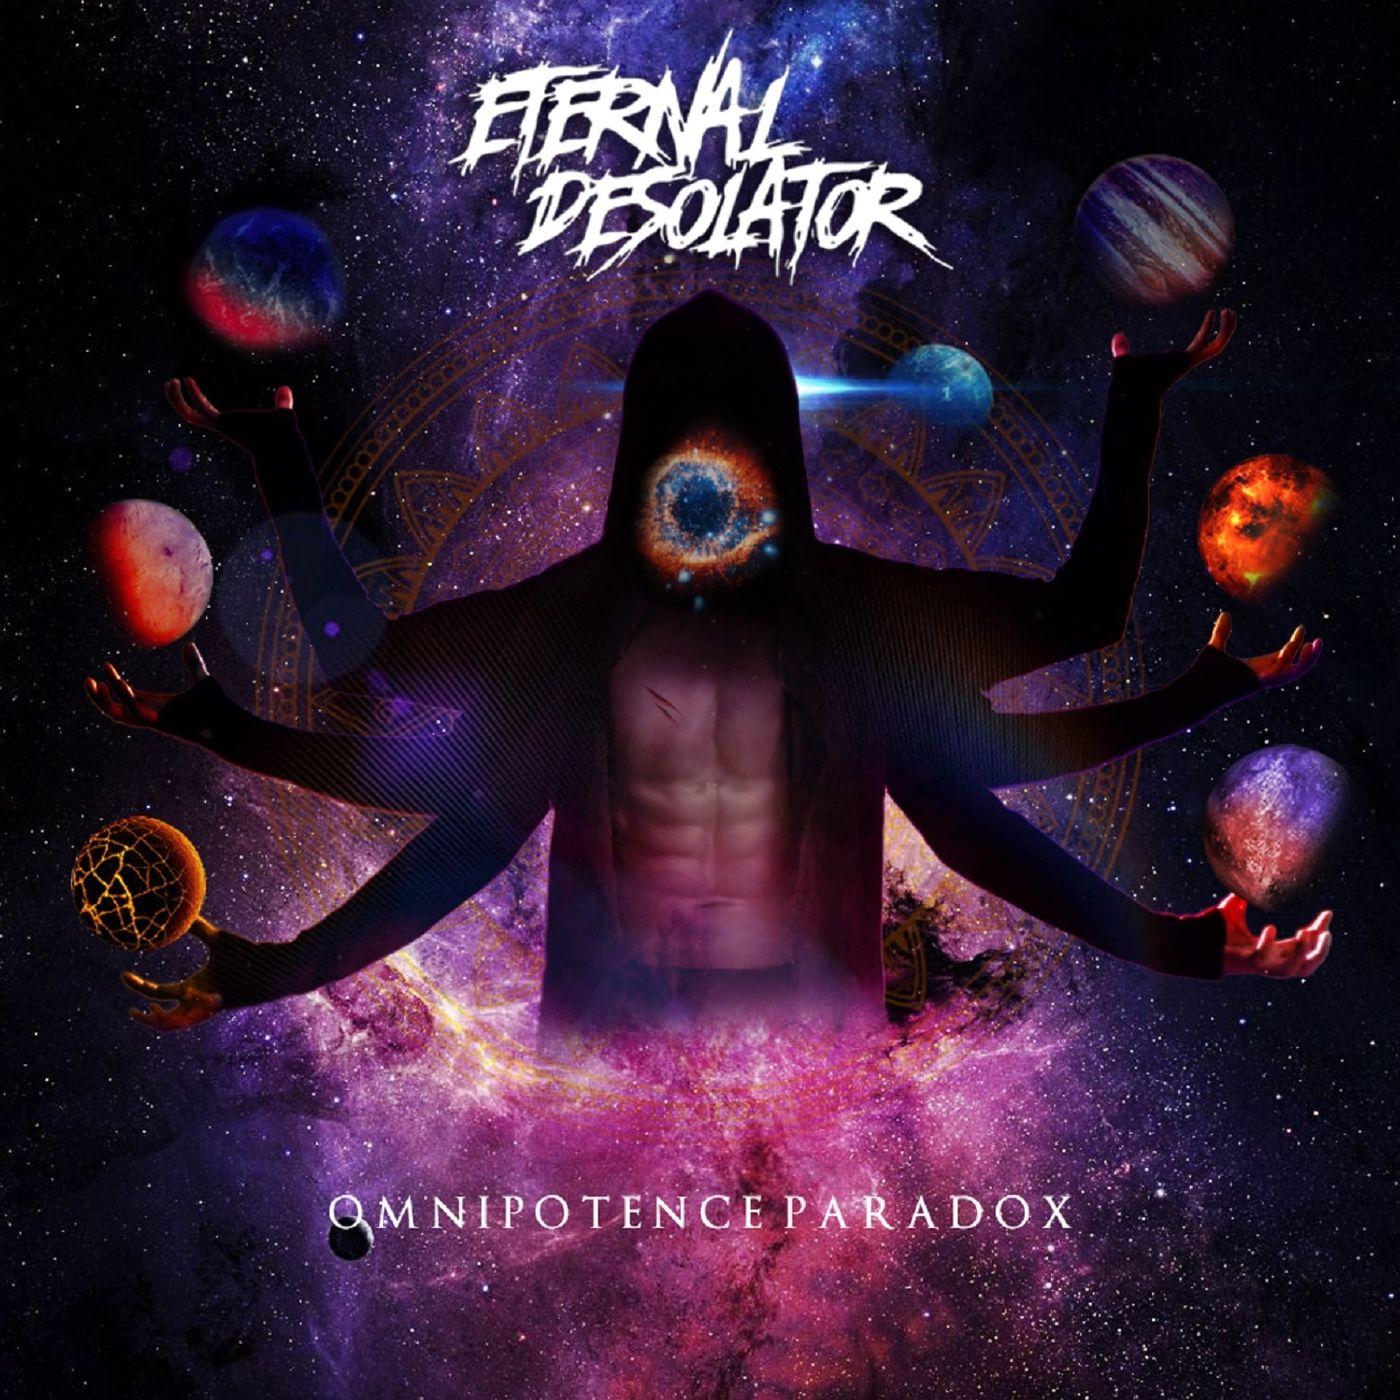 Eternal Desolator - Omnipotence Paradox (2019)